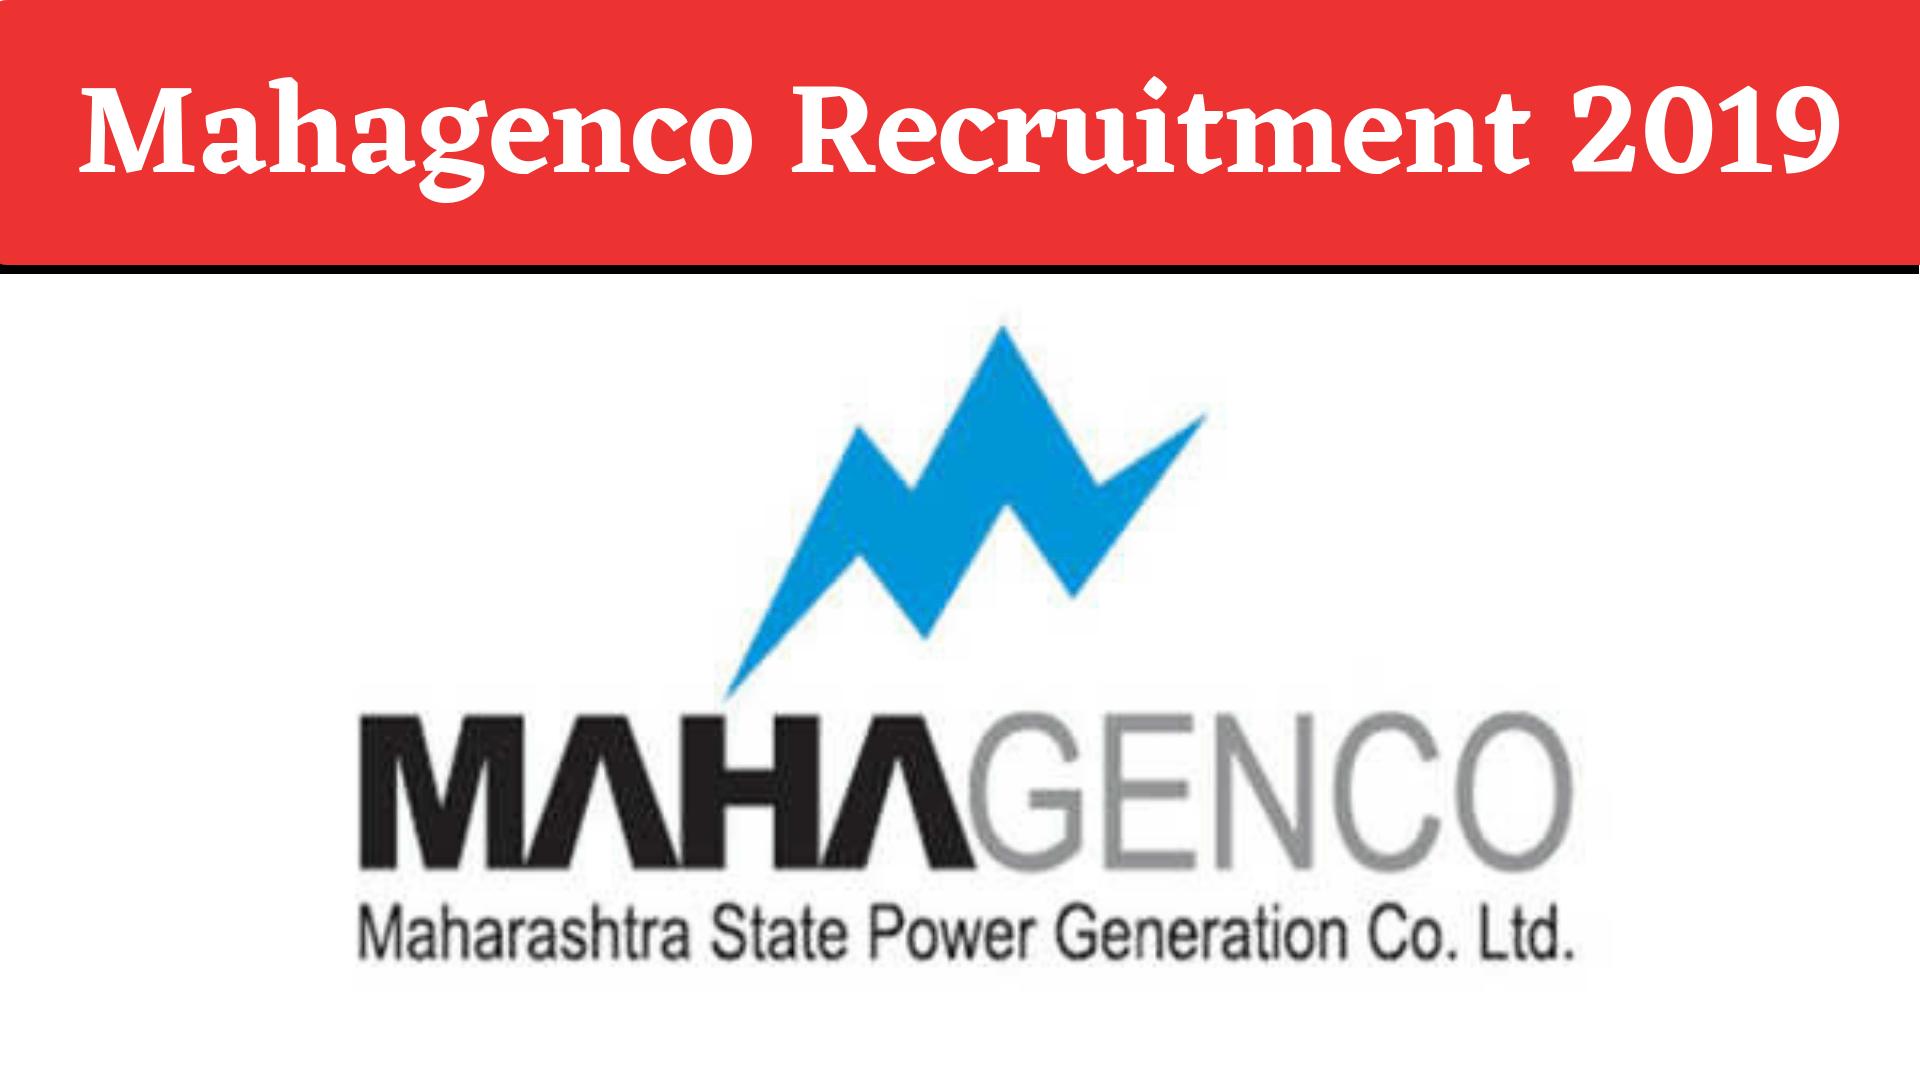 Mahagenco Recruitment 2019